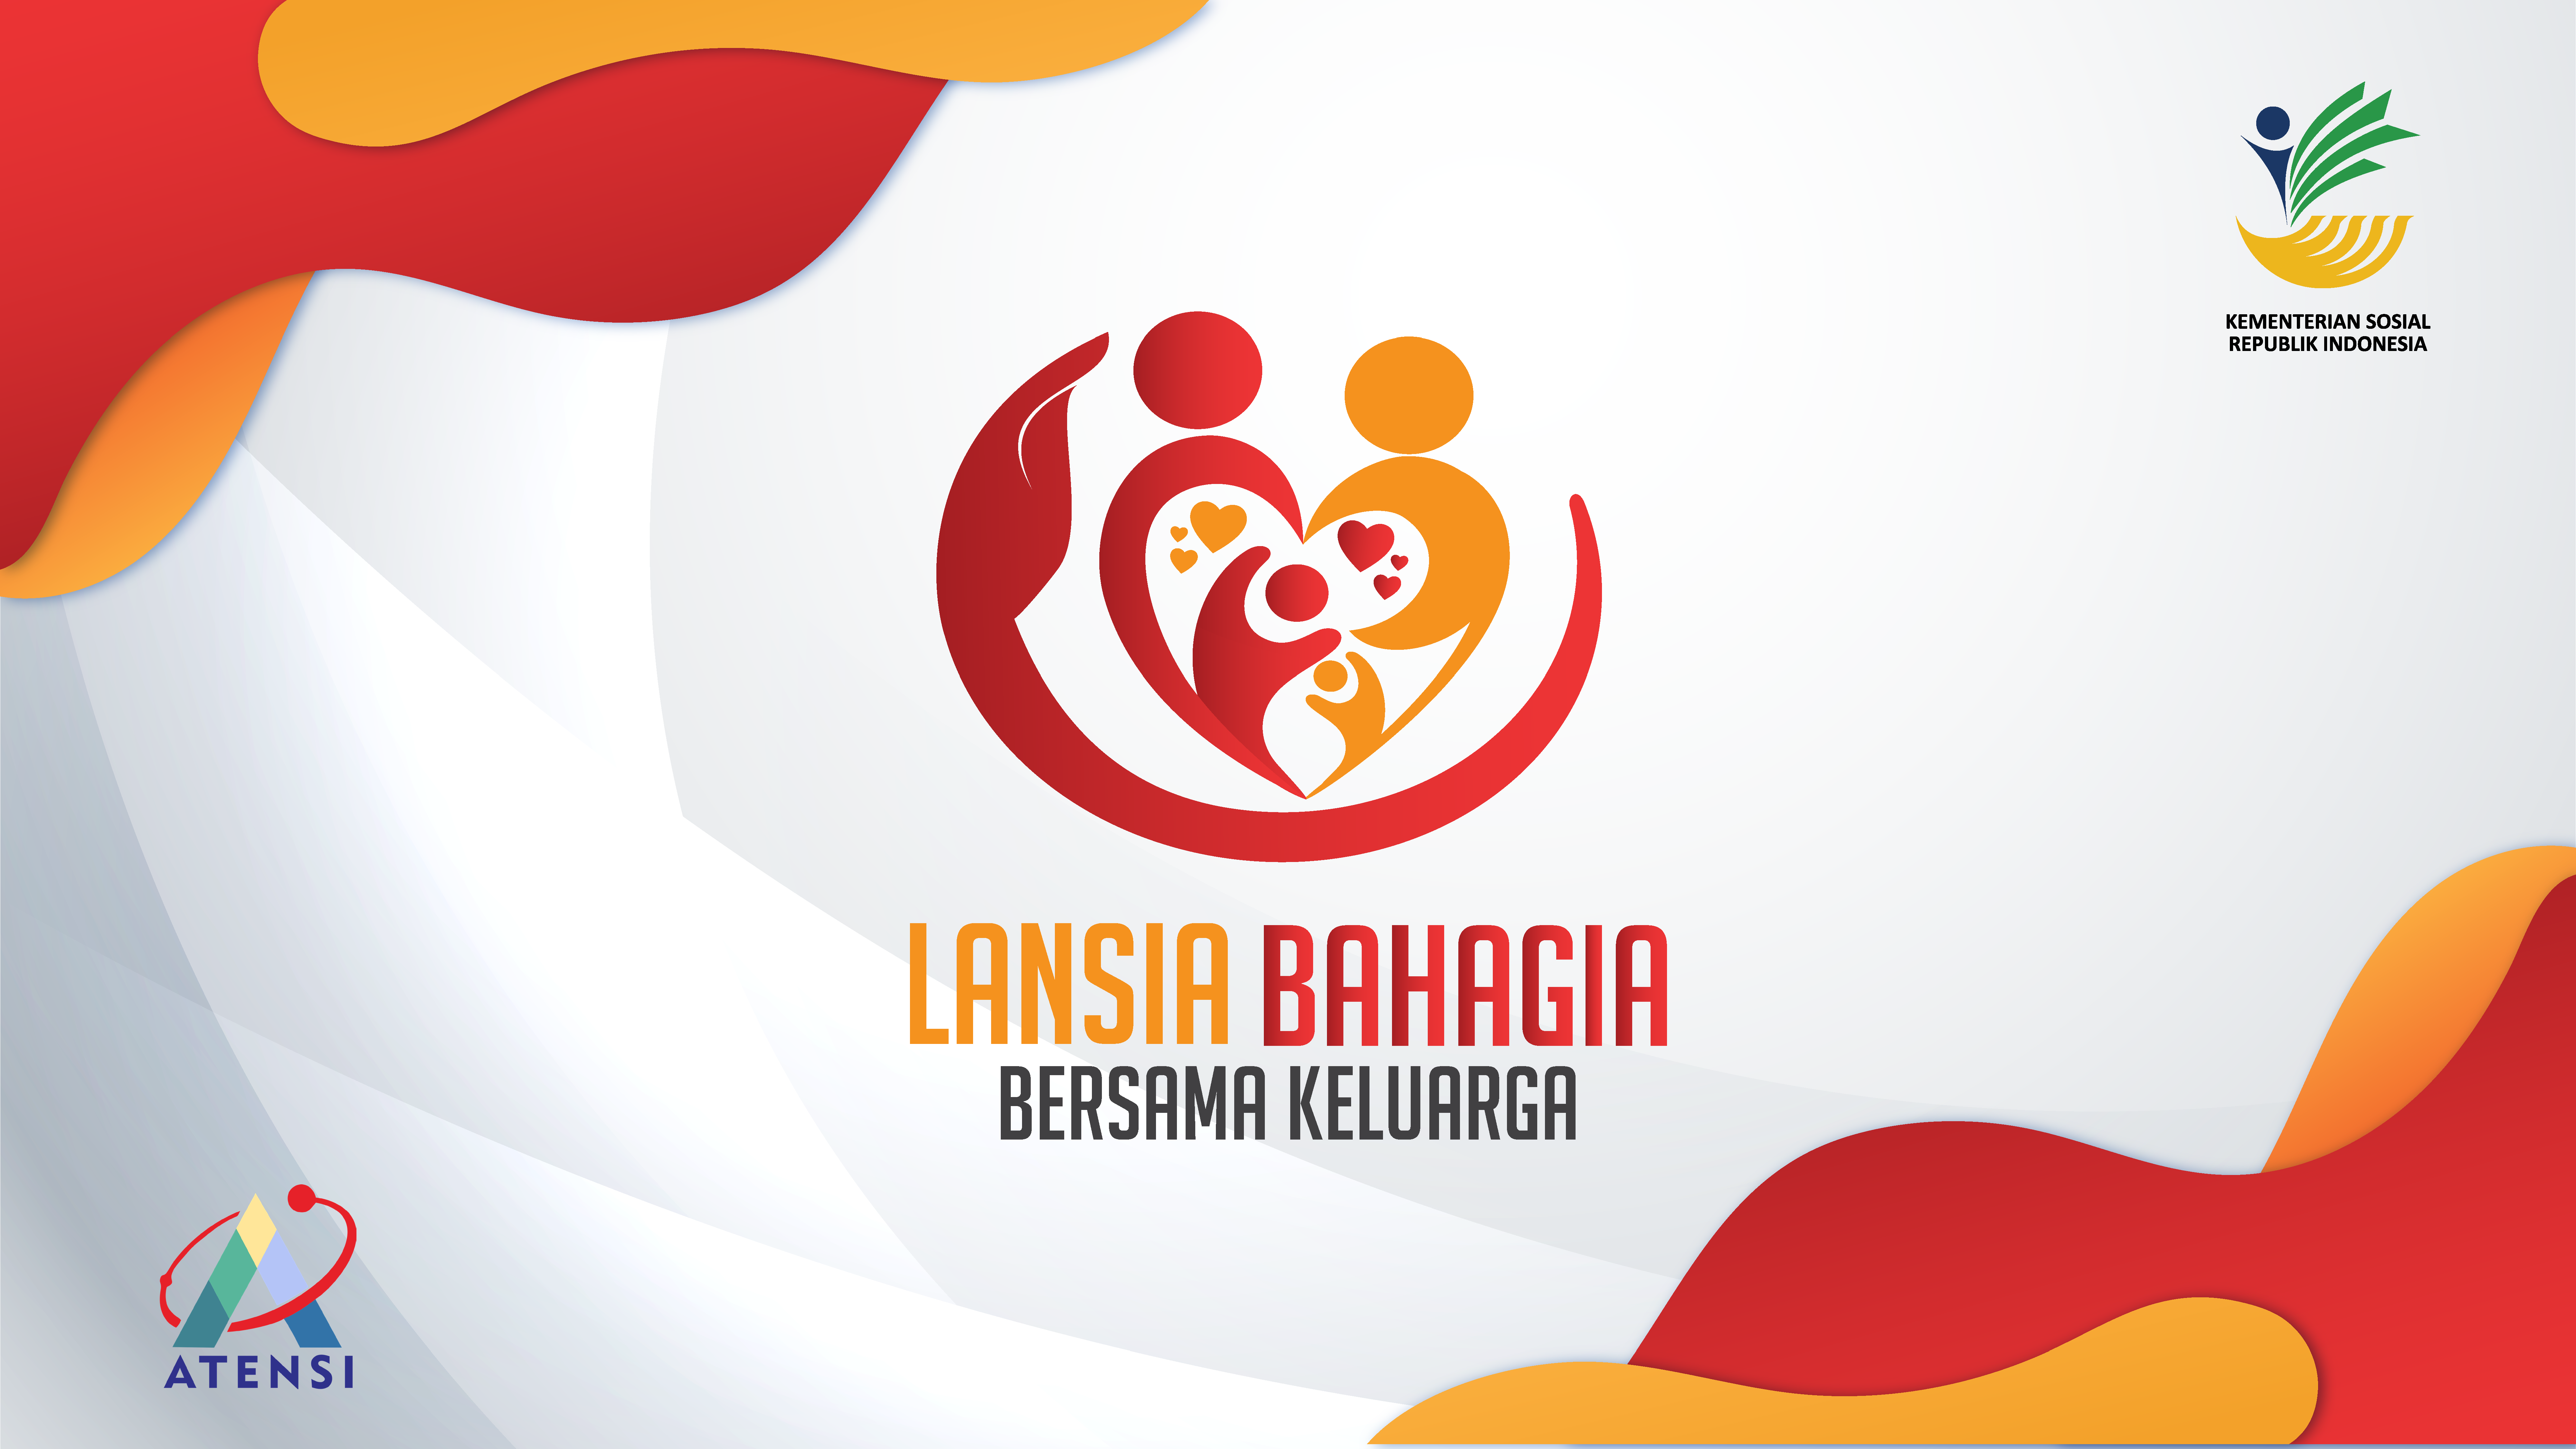 Logo & Kv_2_Lansia Bahagia_Amenah_Page_1